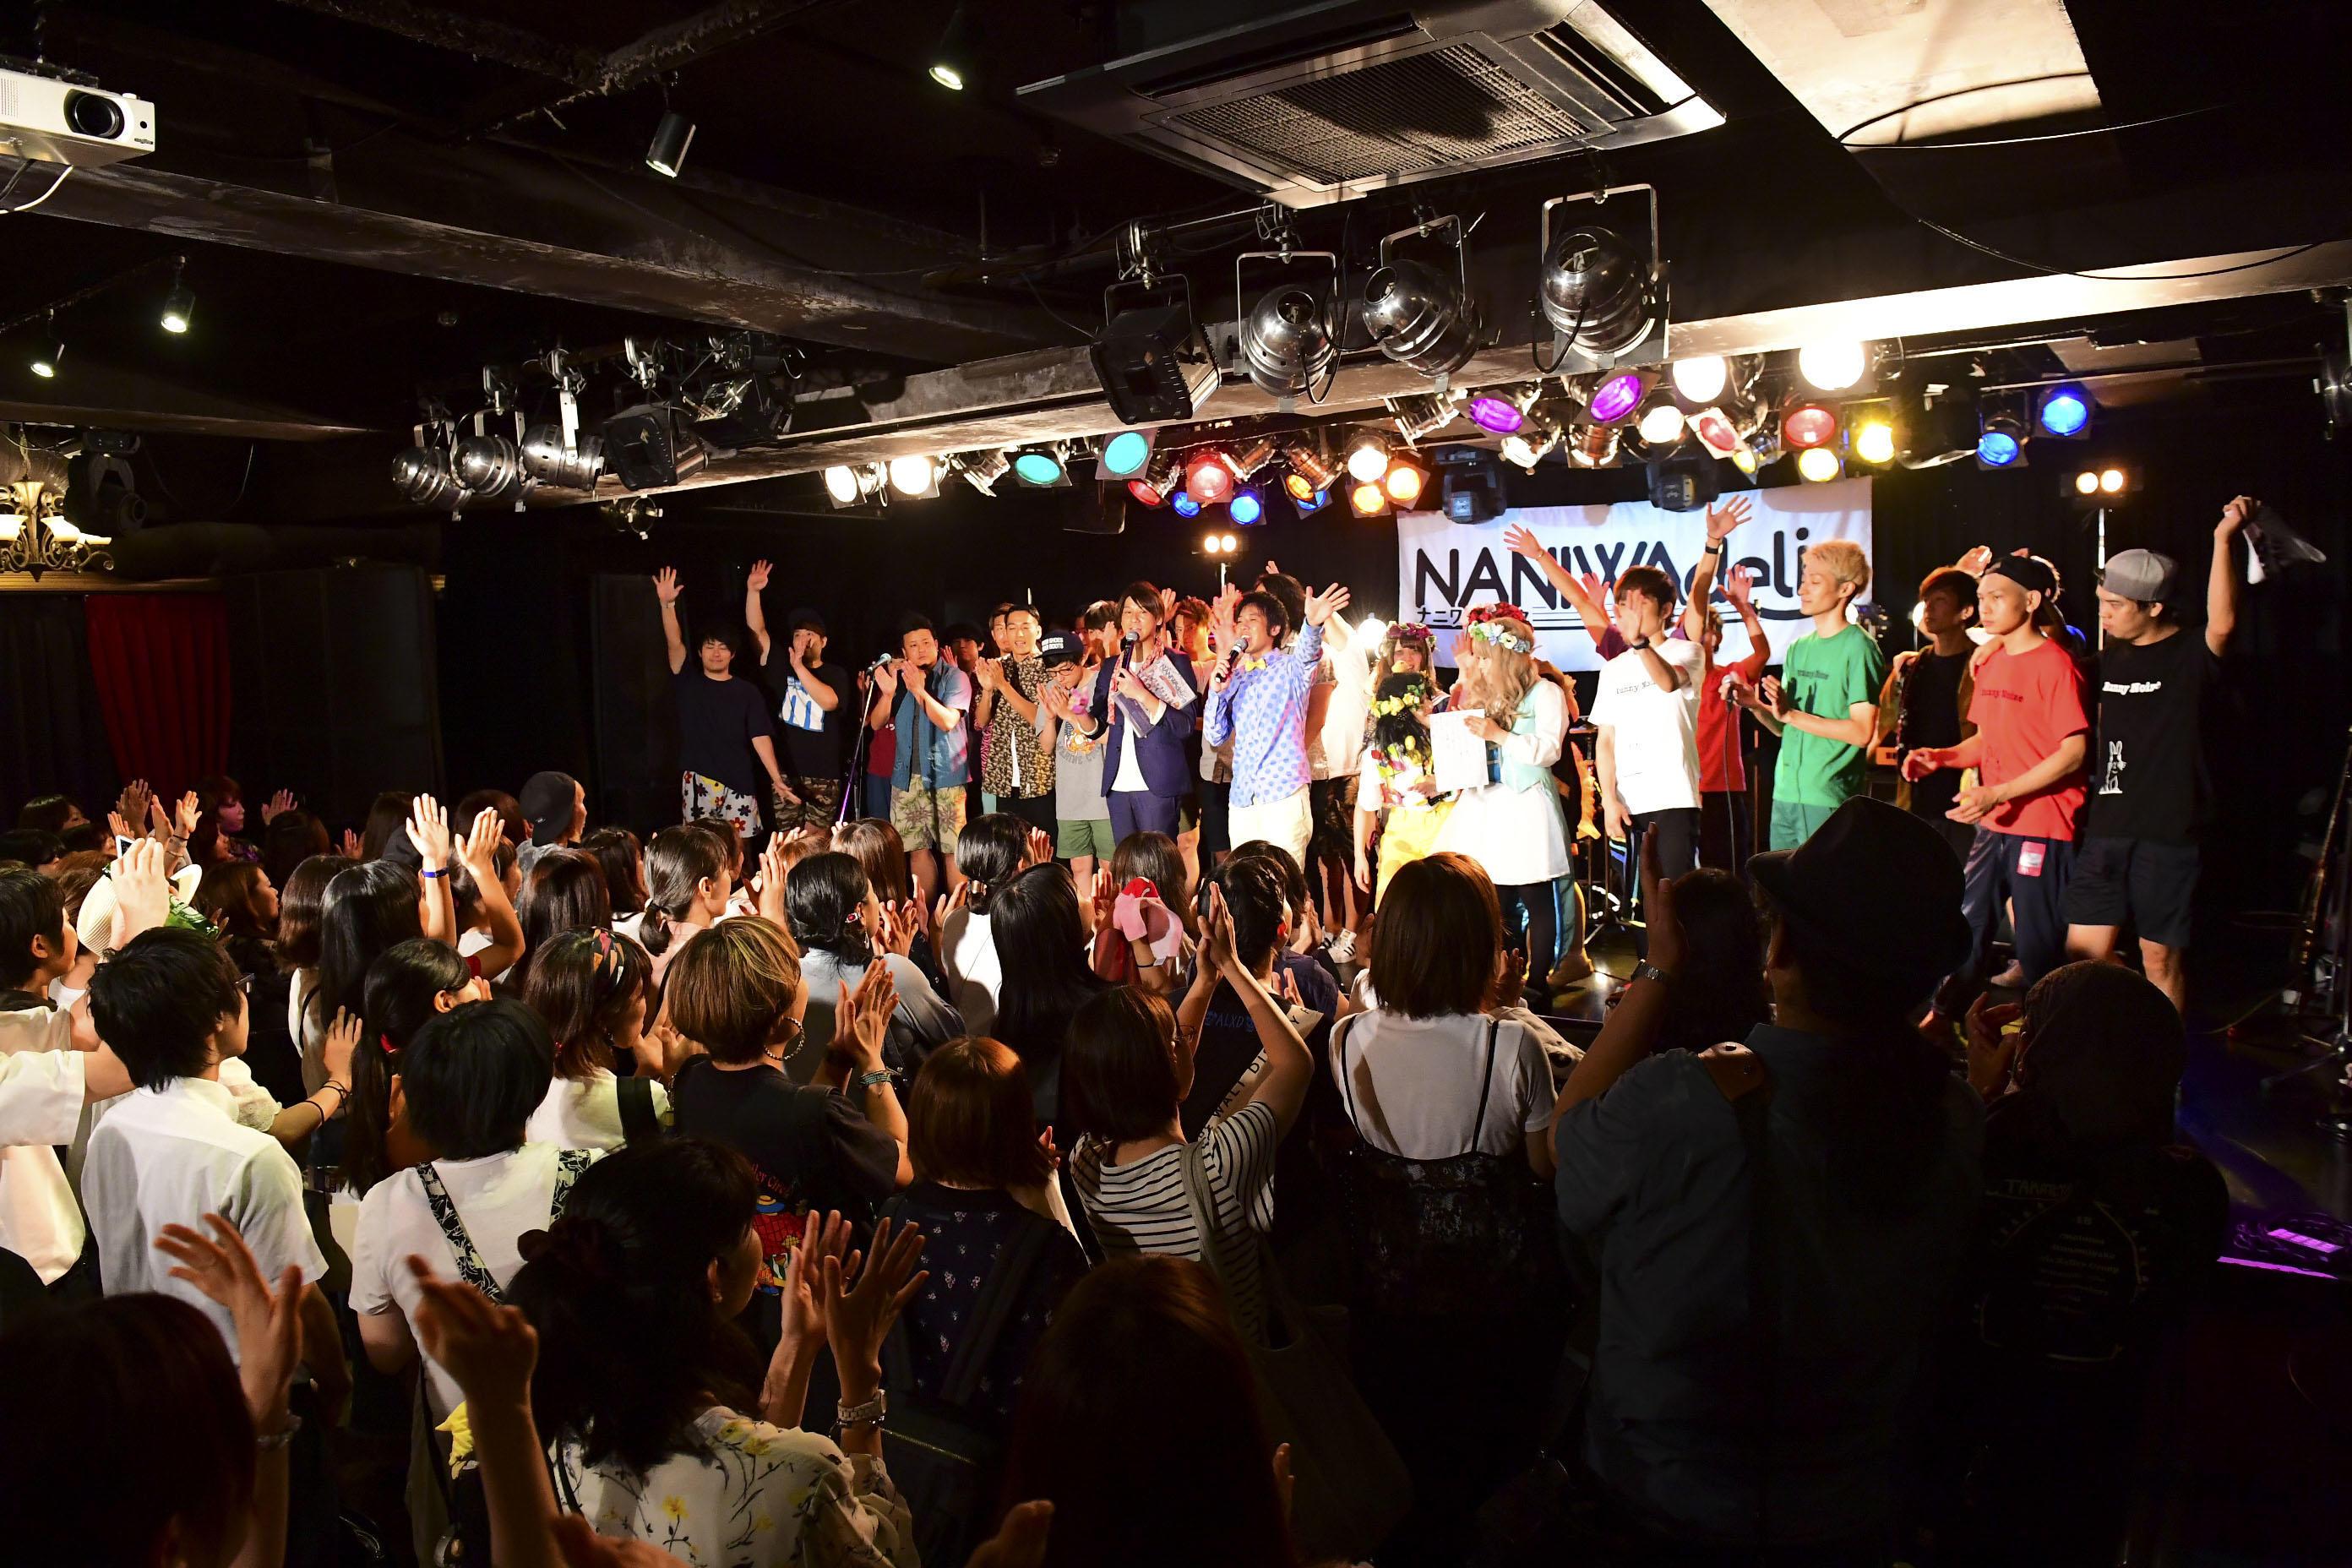 http://news.yoshimoto.co.jp/20170802095442-5a8ebaffc4d2c8e5a9305969693a731bc2faf372.jpg